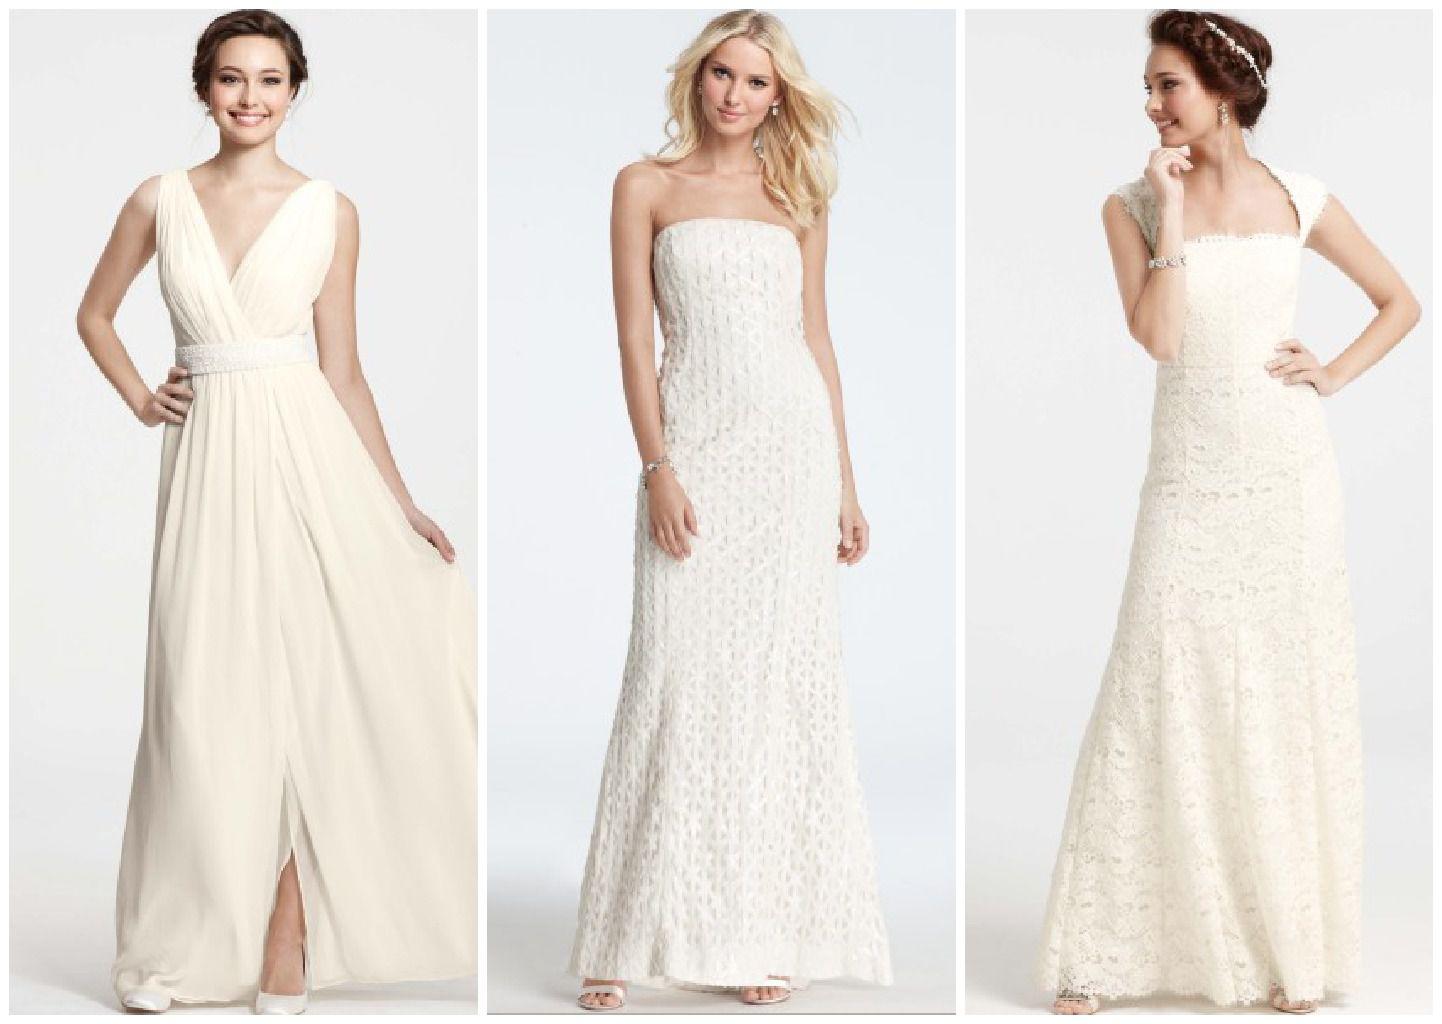 bda469a0bbcc Lace Wedding Gown Goddess Wedding Gown Ann Taylor Dresses ...